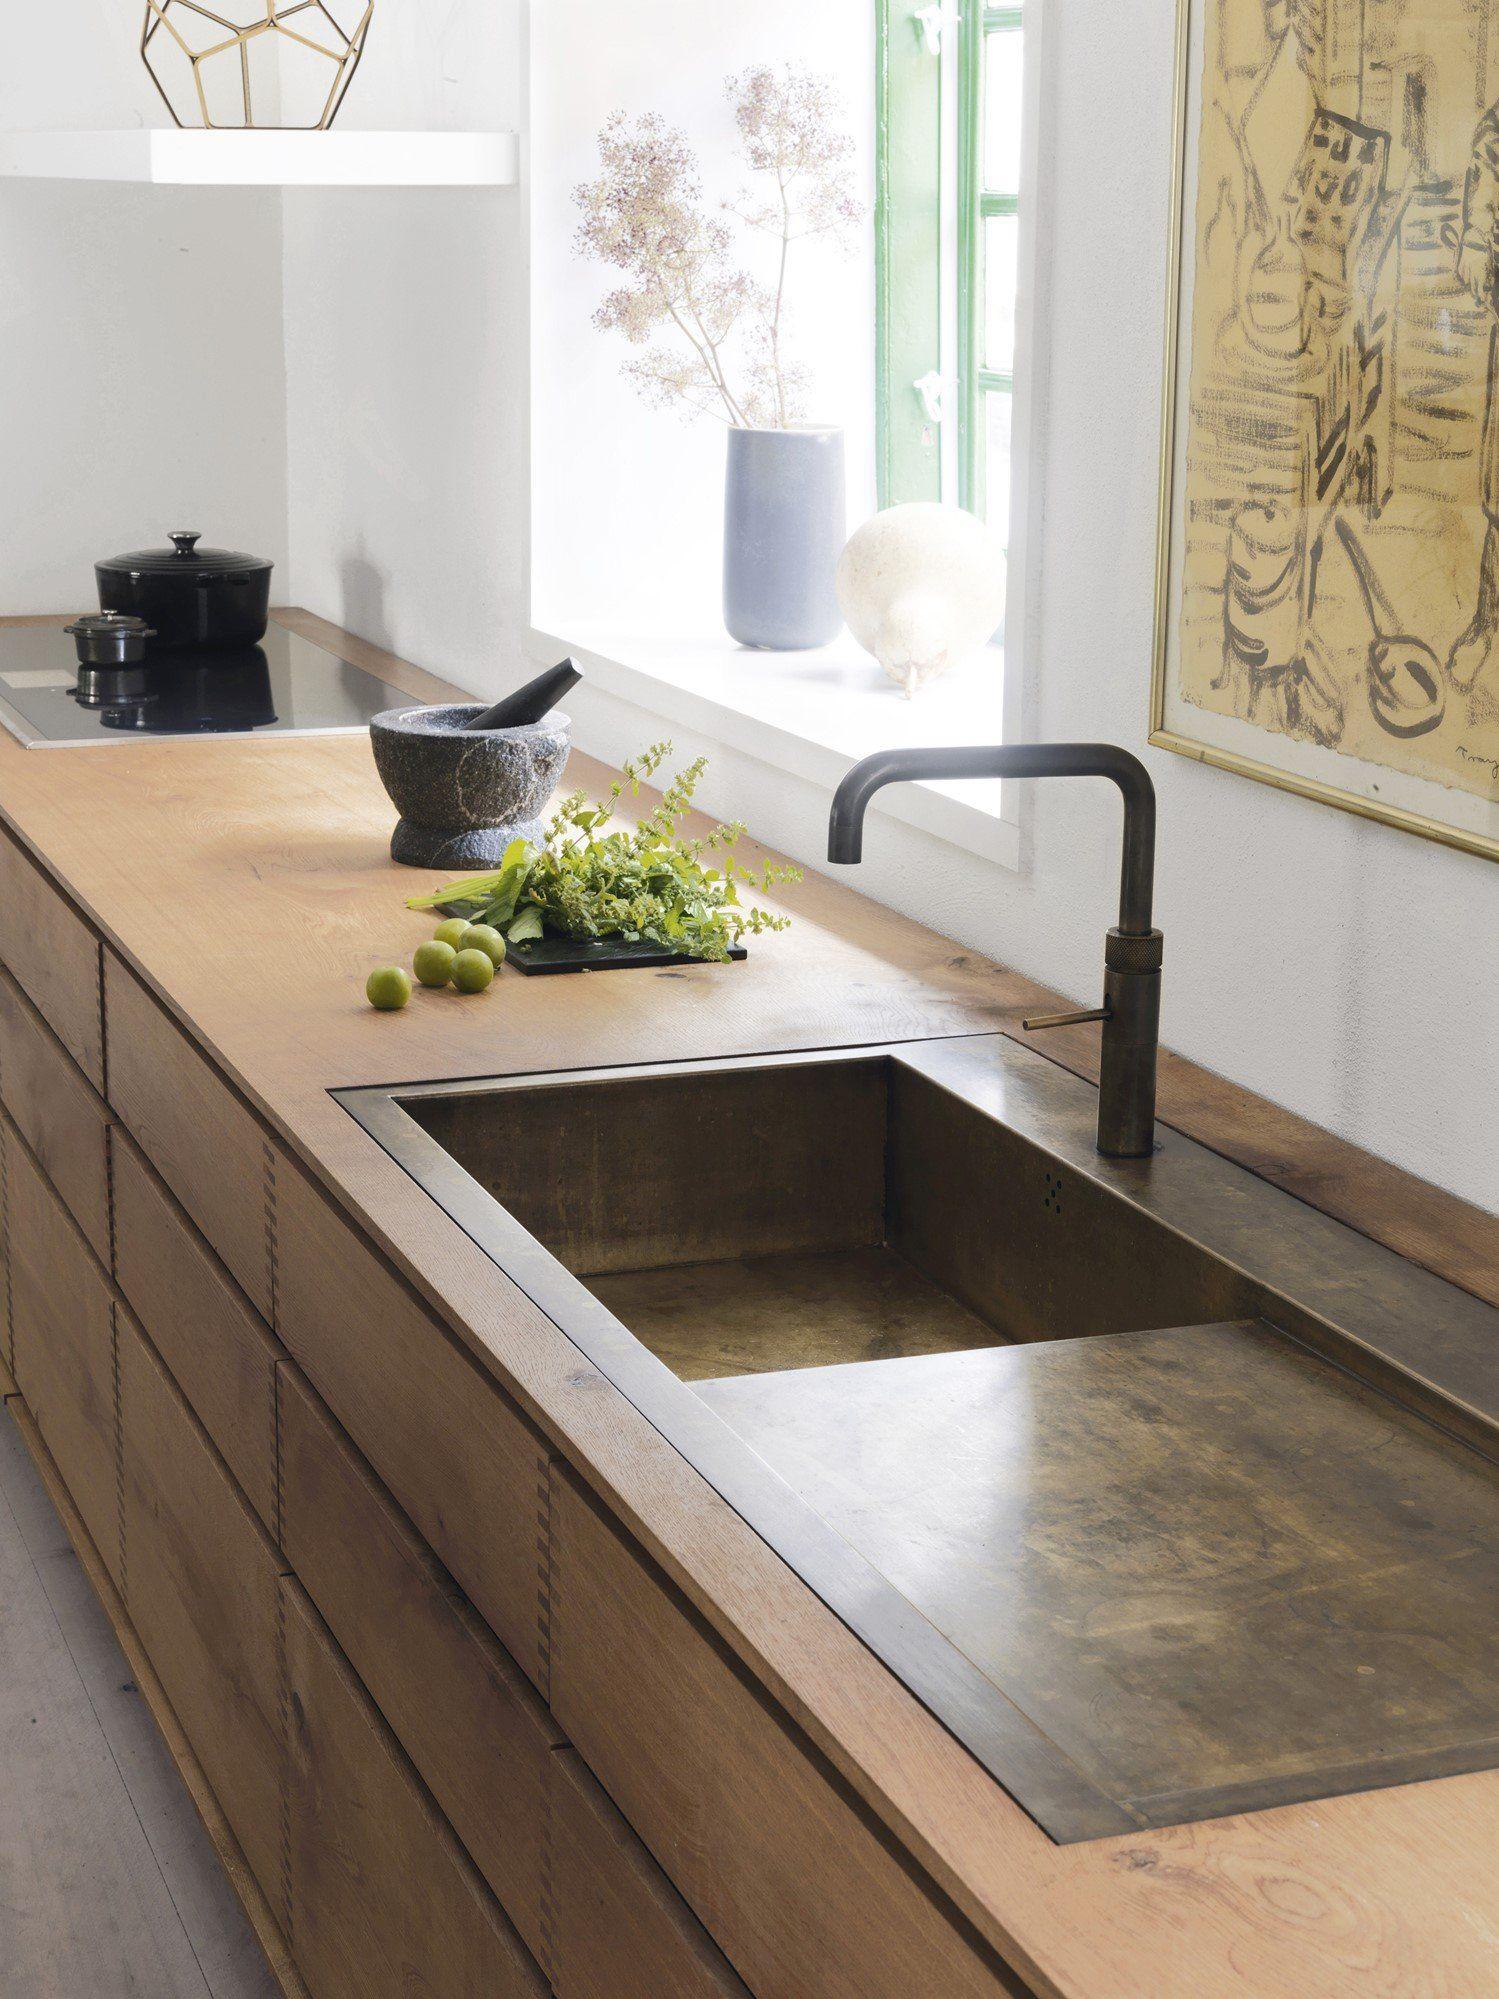 Cuisine minimaliste en bois et bronze | Minimalist Kitchen, Wood and bronze